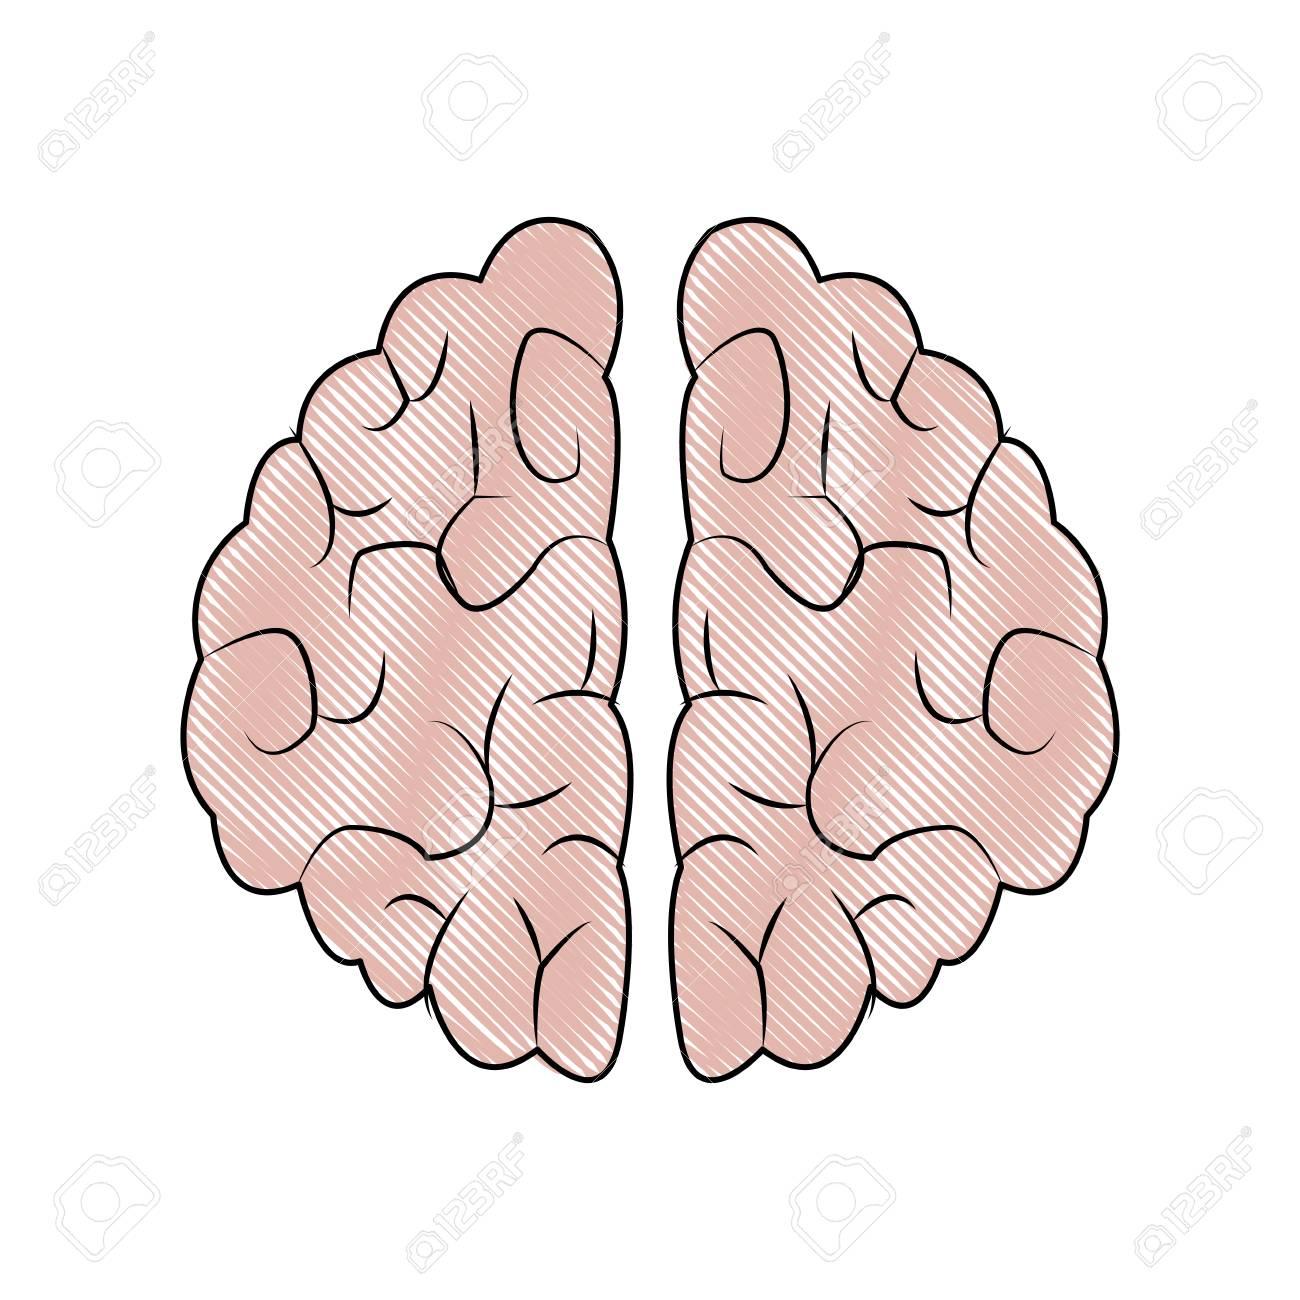 Human Brain Organ Health Memory Anatomy Vector Illustration Royalty